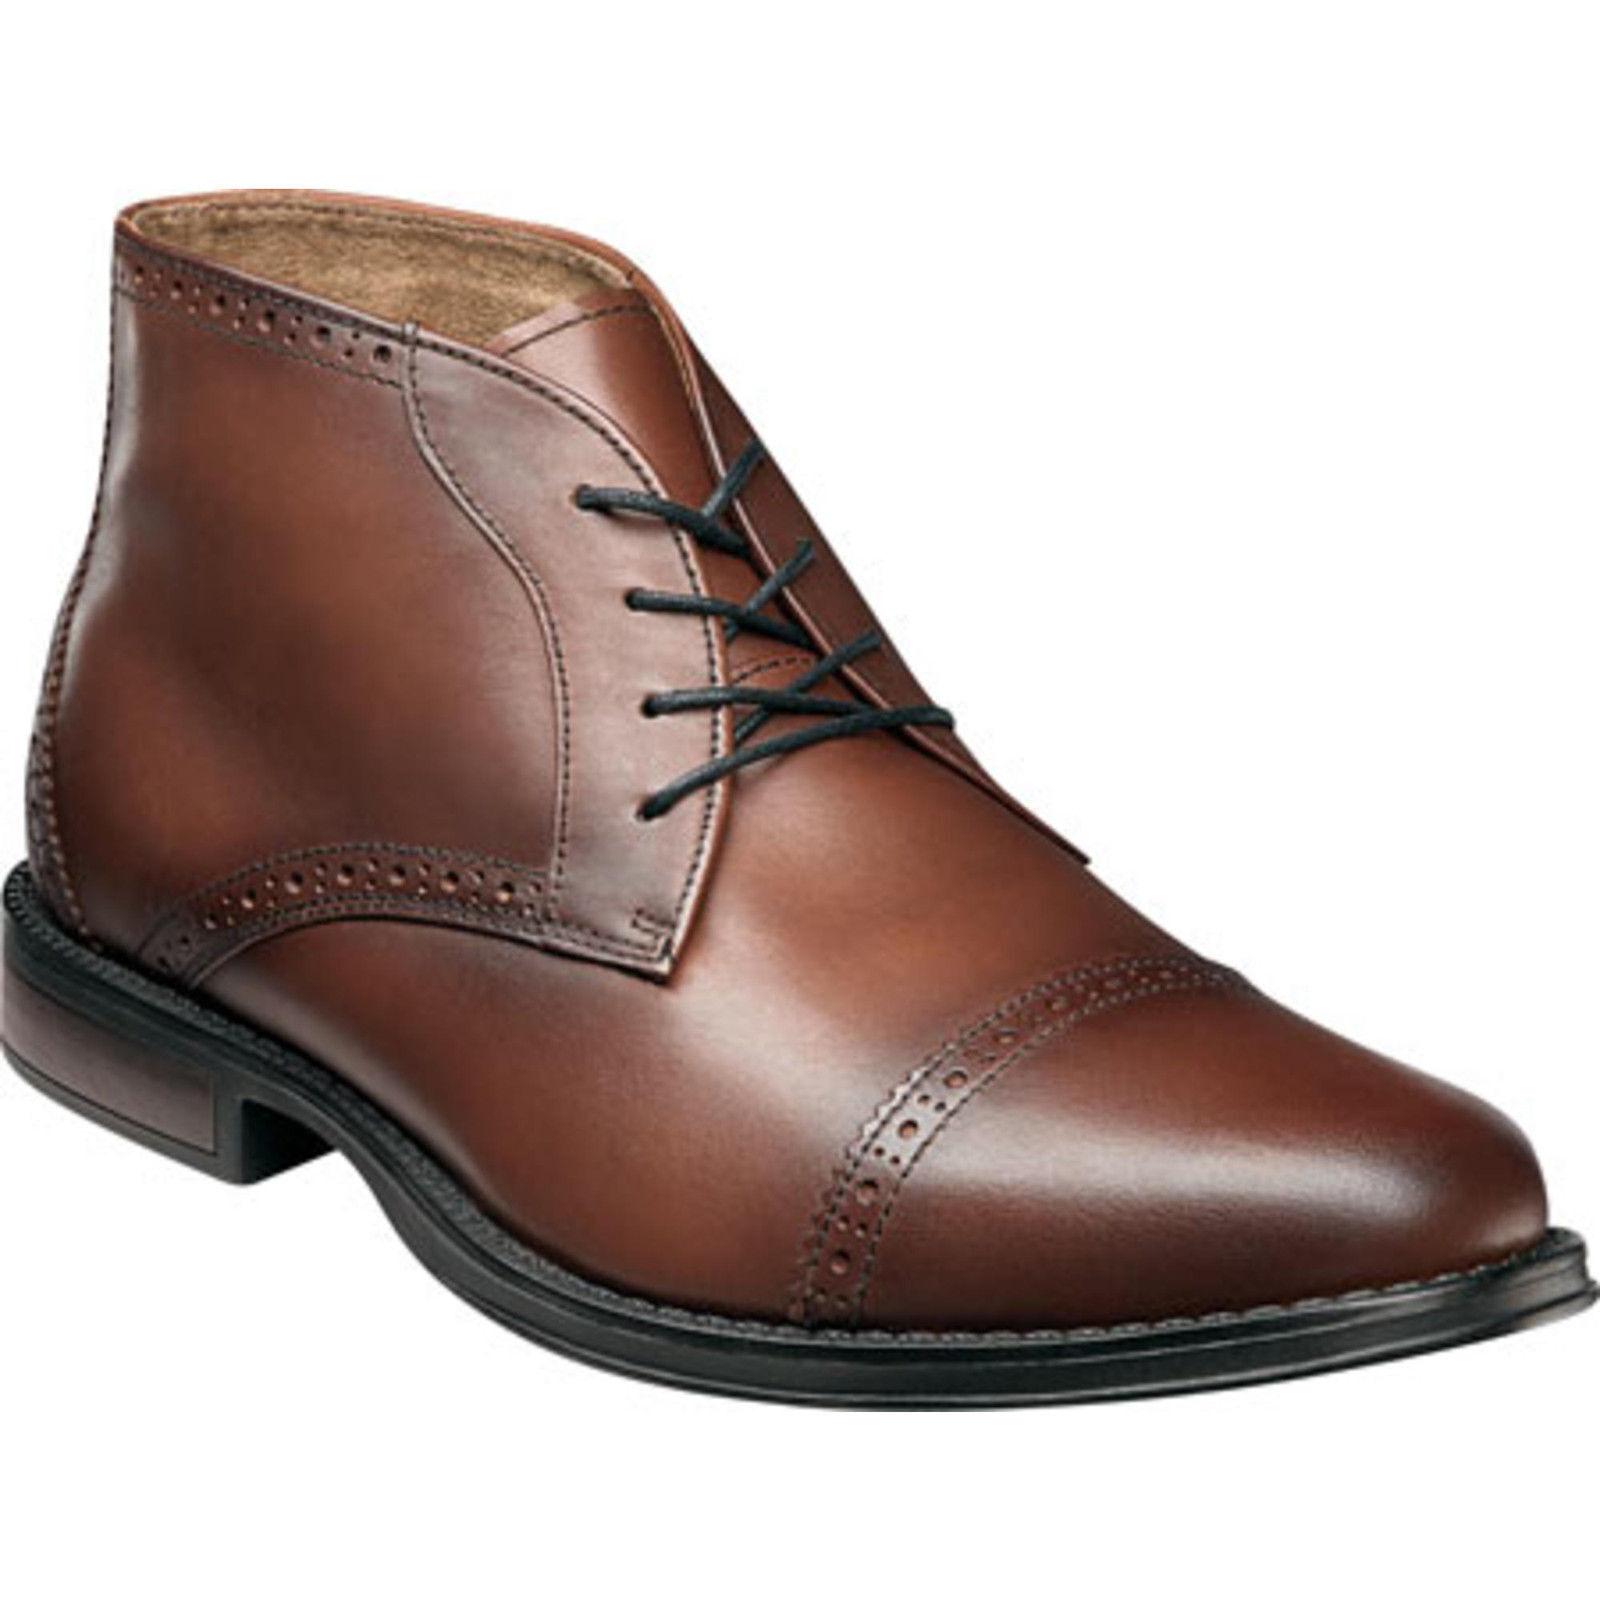 Nunn Bush Men's Robinson Chestnut Leather Chukka Boot 84626-205